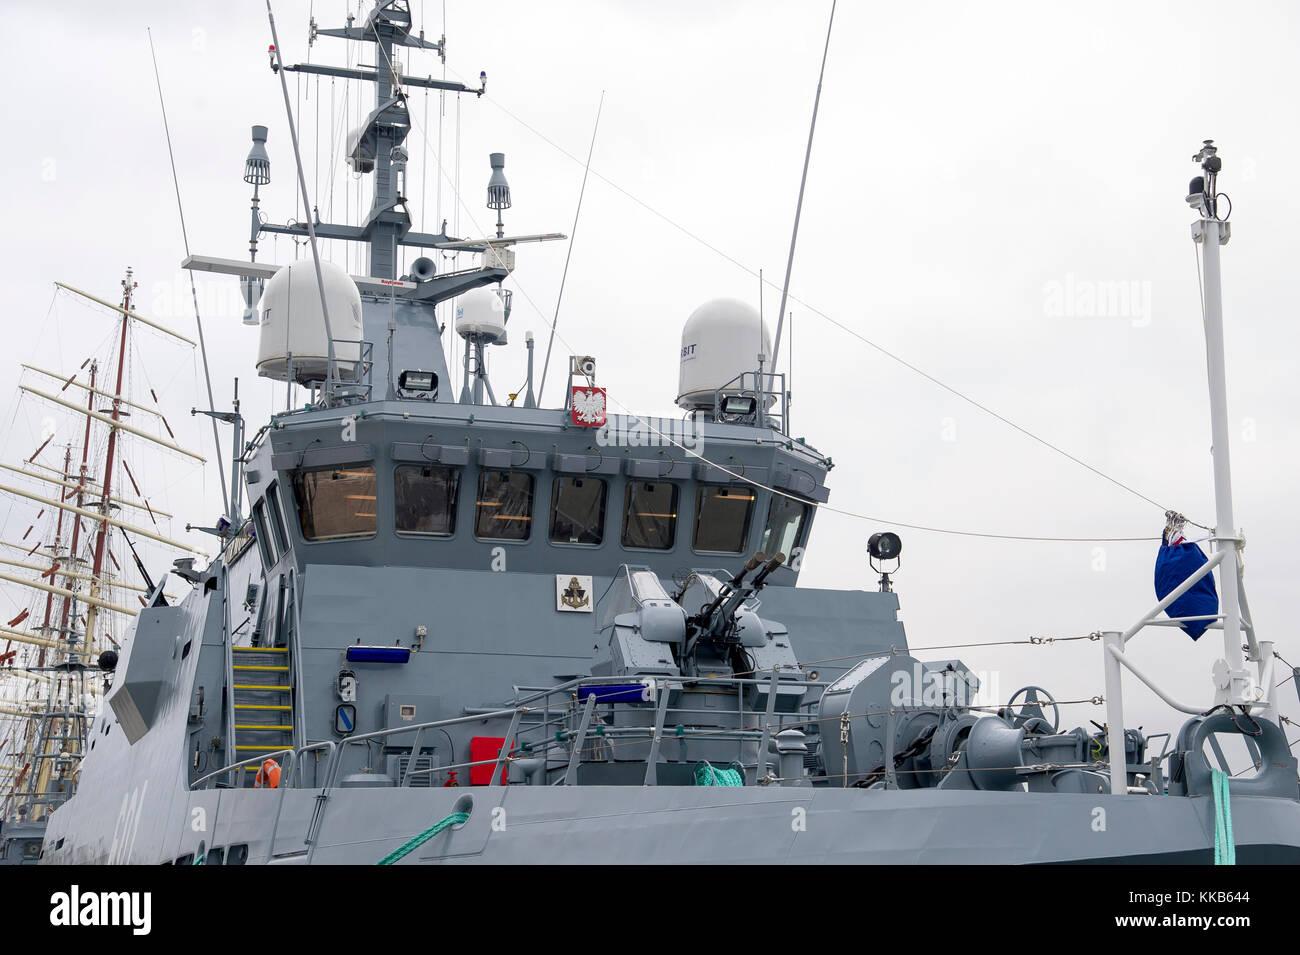 ORP Kormoran, Kormoran II class minehunter, the newest Polish Navy vessel, in Gdynia, Poland. 27 November 2017  - Stock Image